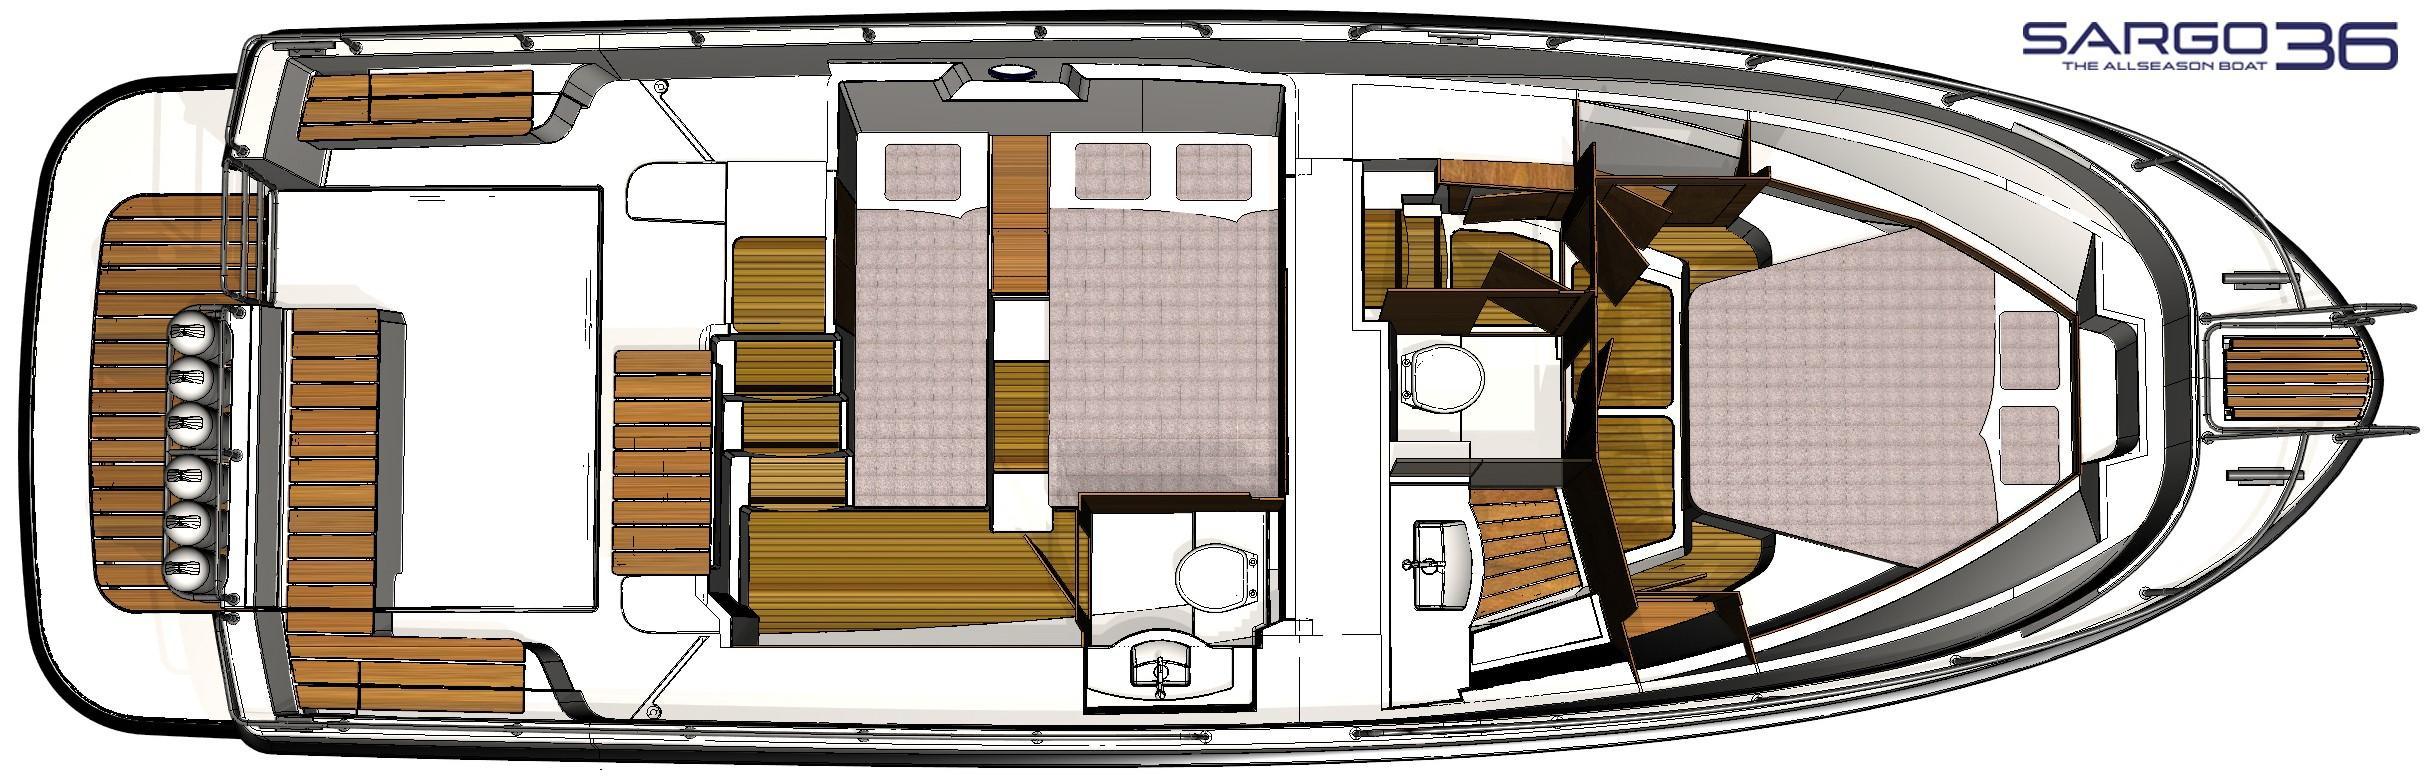 Sargo 36 accommodation plan